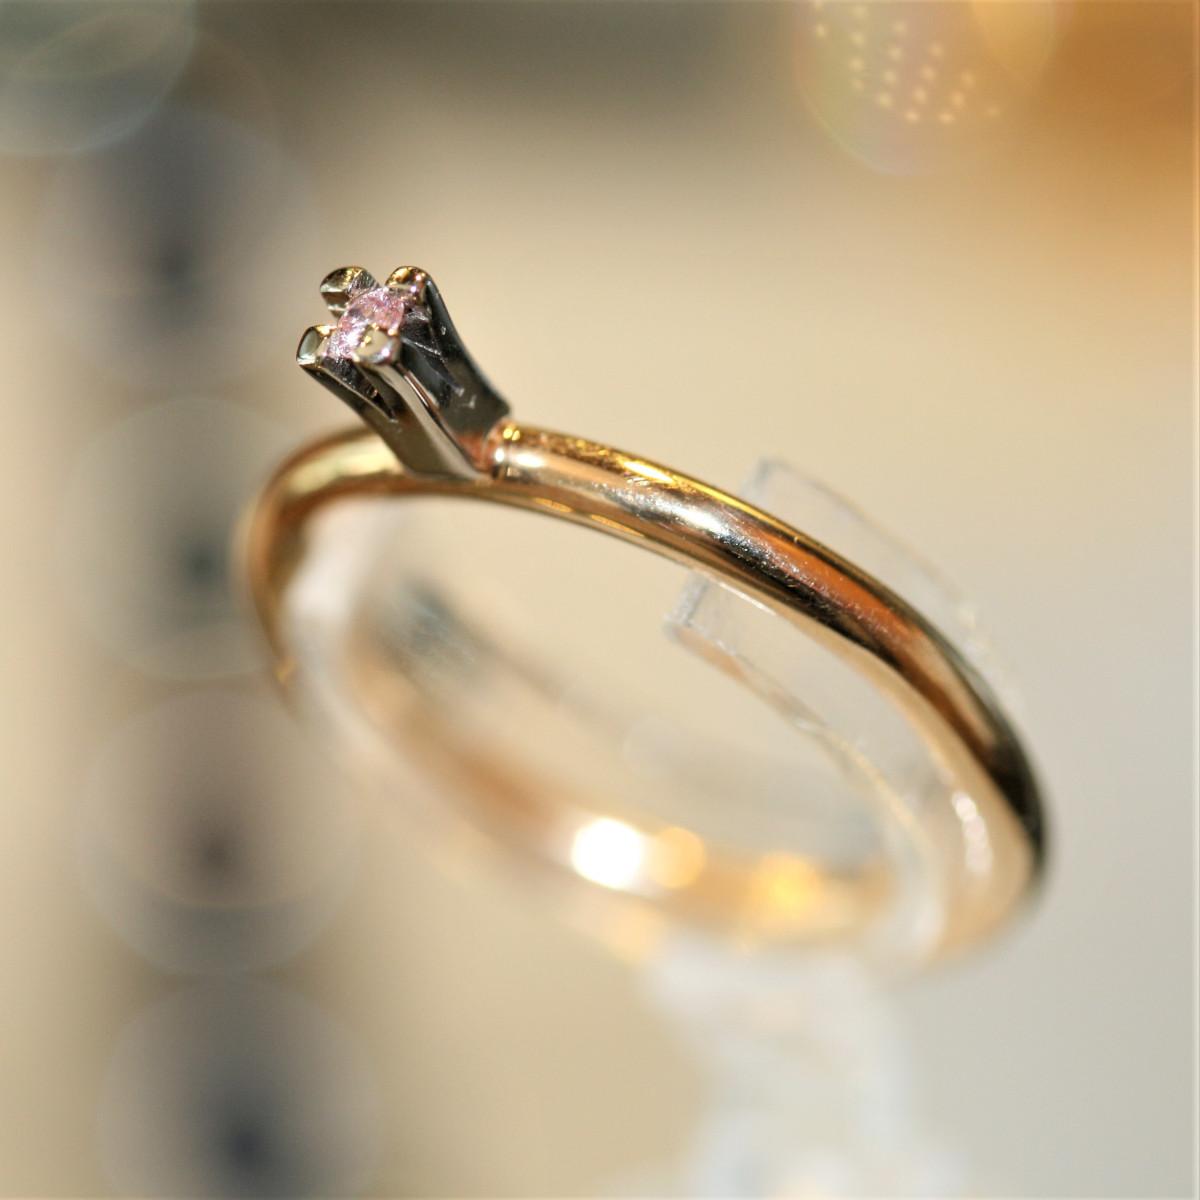 Rosa diamanter, enstensring, guldring